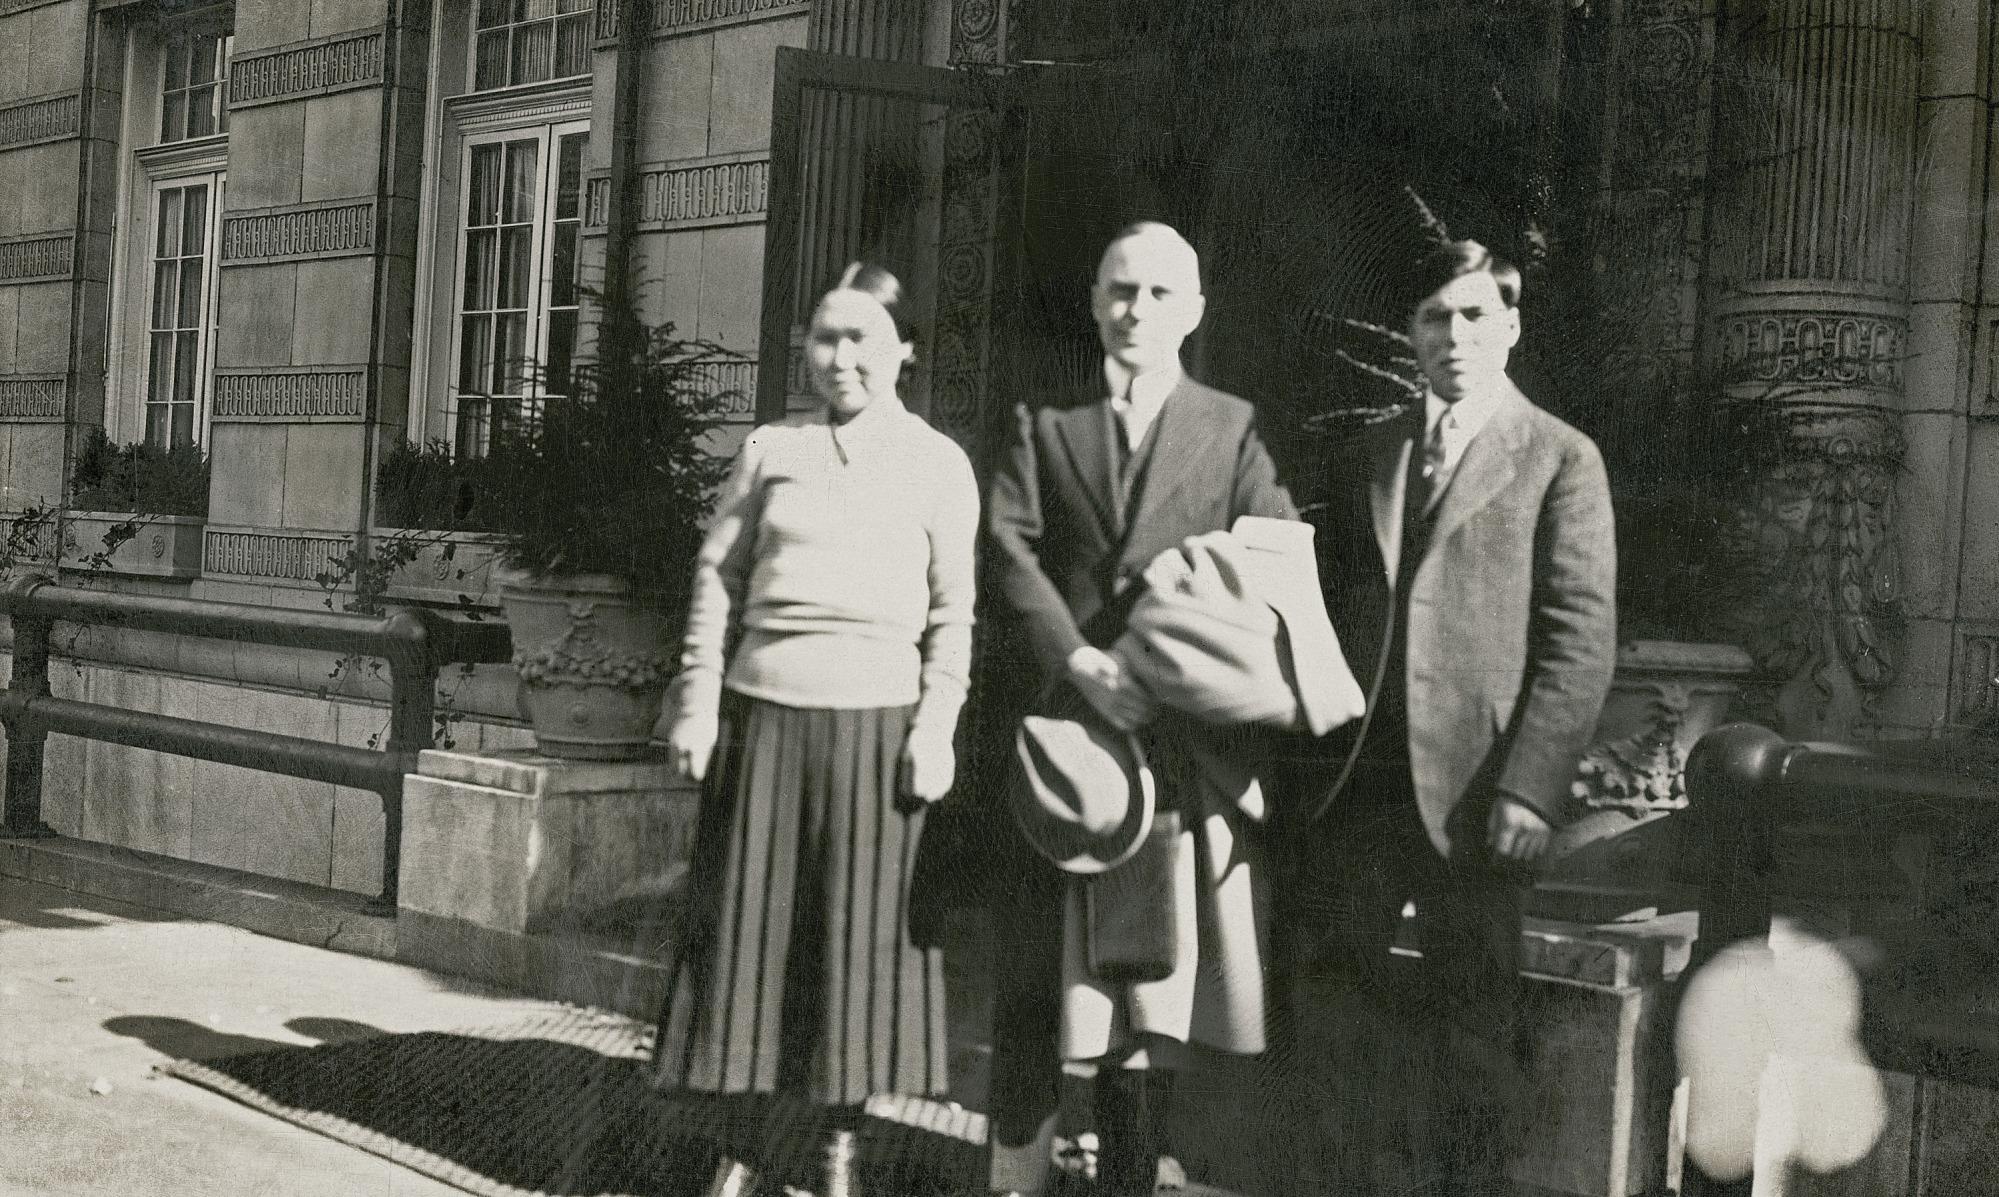 Danish Legation Secretary with Armarulunguak and Miteq